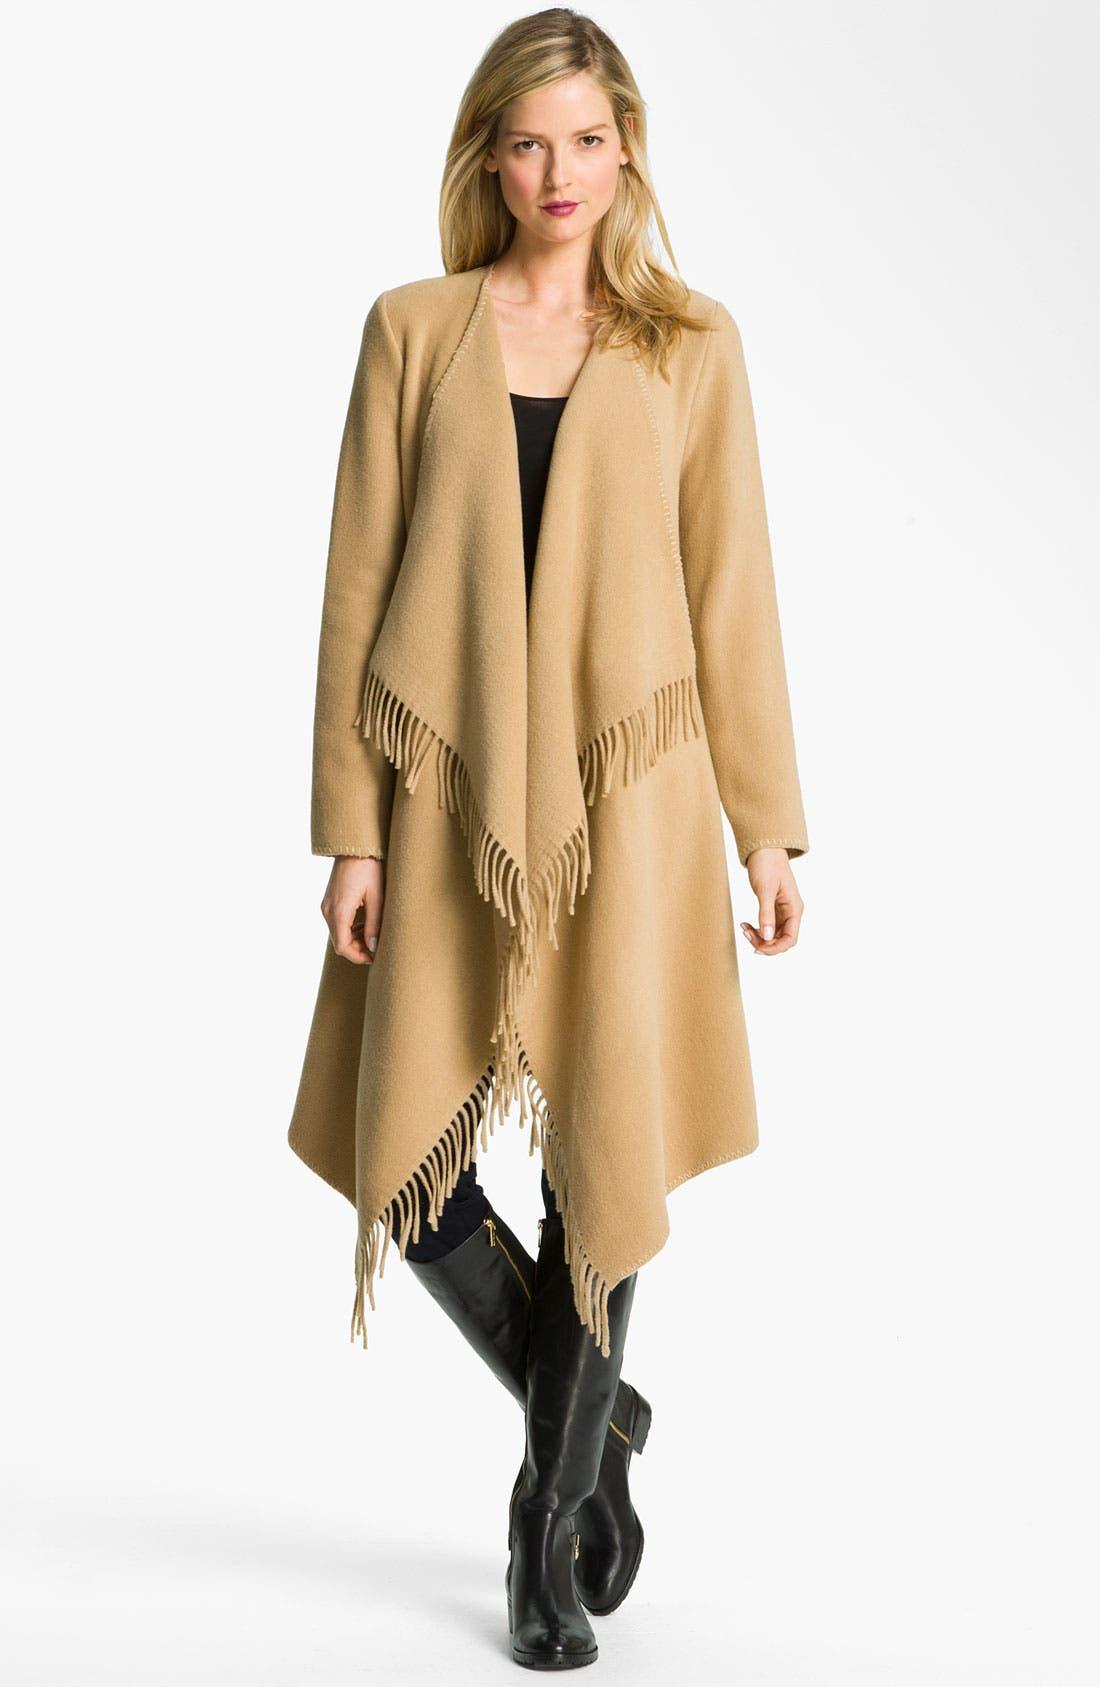 Alternate Image 1 Selected - MICHAEL Michael Kors Fringed Wool Blend Coat